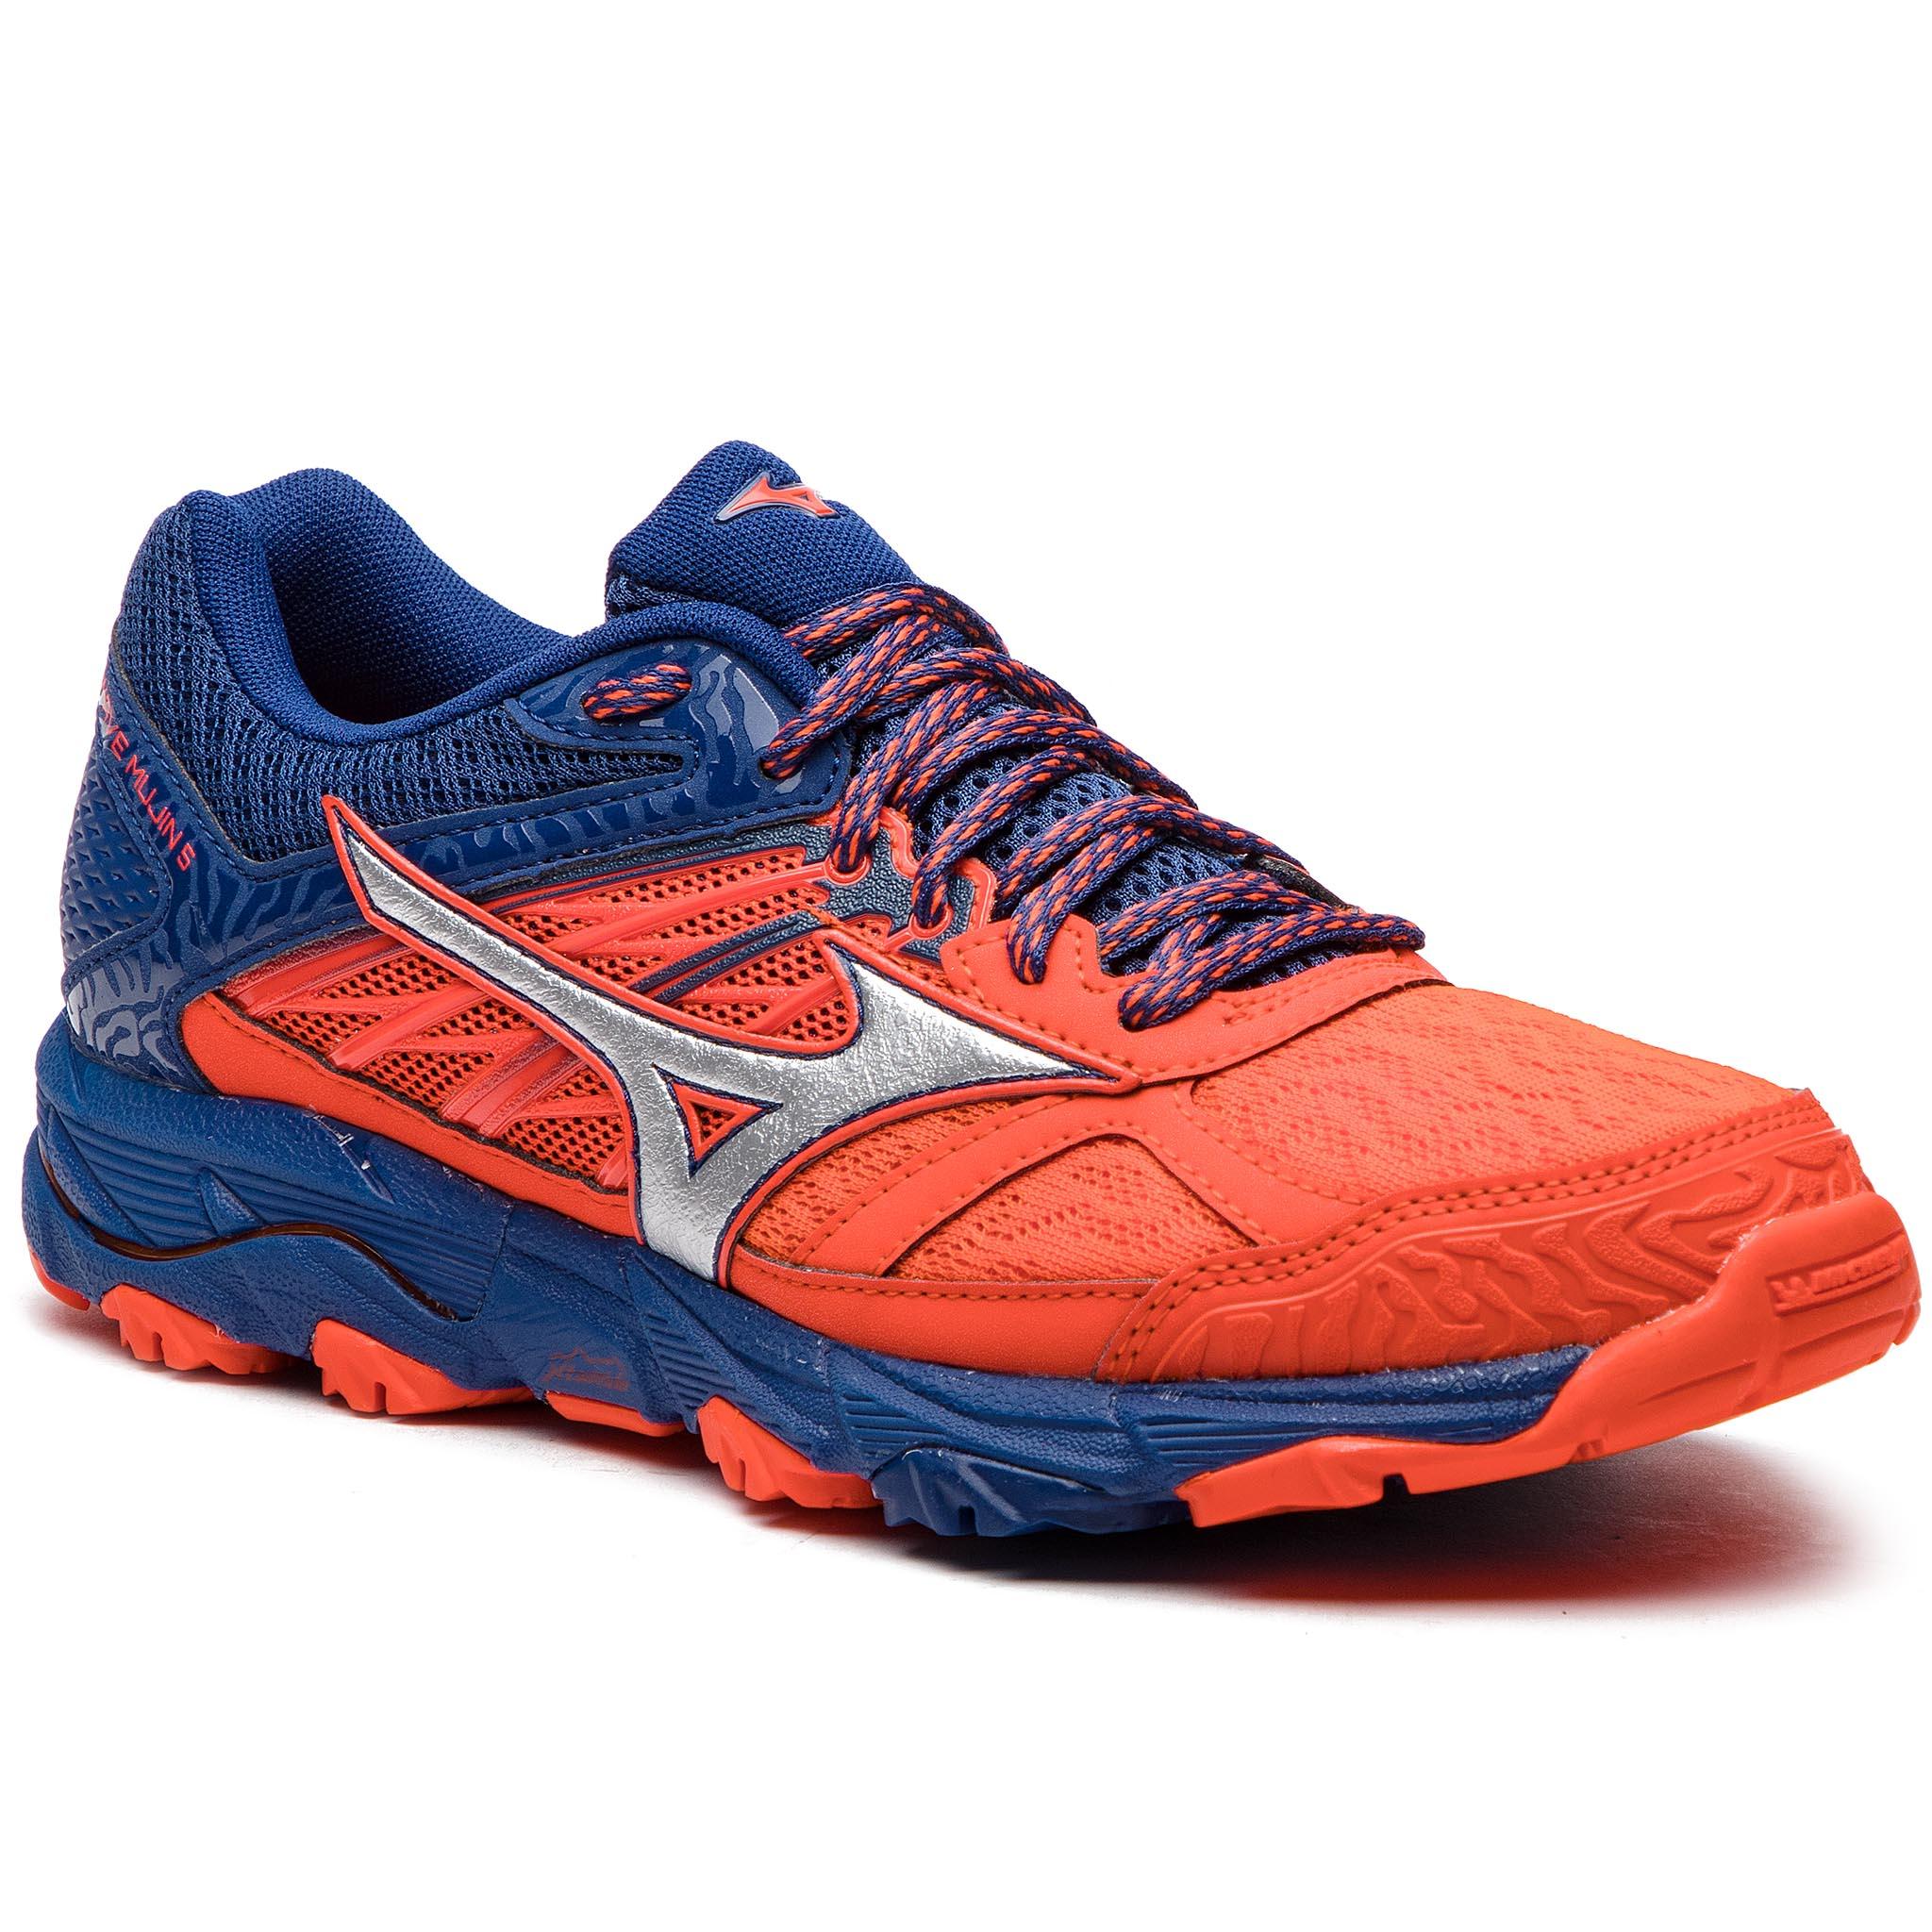 Topánky MIZUNO - Wave Mujin 5 J1GJ187003 Oranžová Tmavo modrá - Glami.sk 944b13557d7